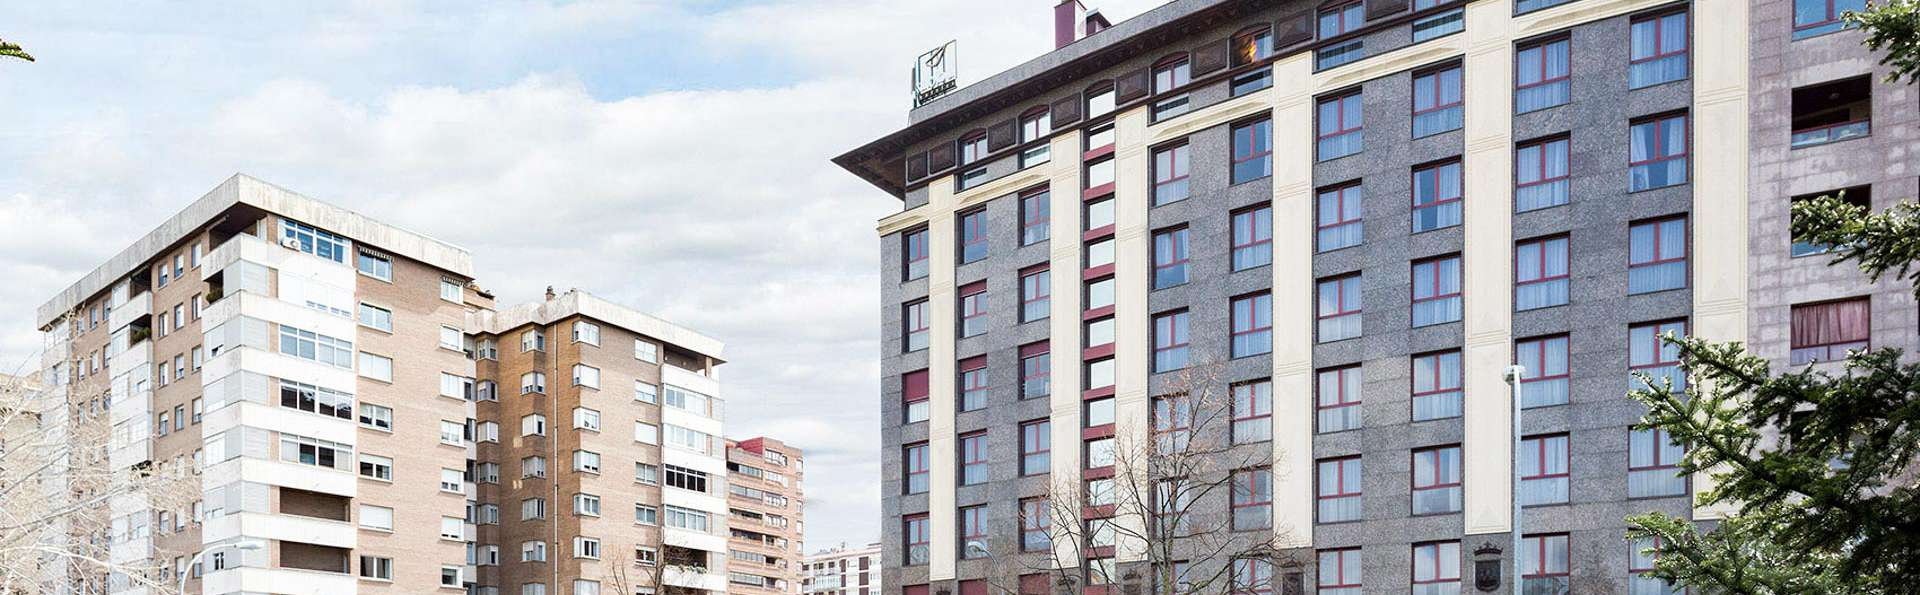 Abba Reino de Navarra Hotel - EDIT_FRONT_01.jpg